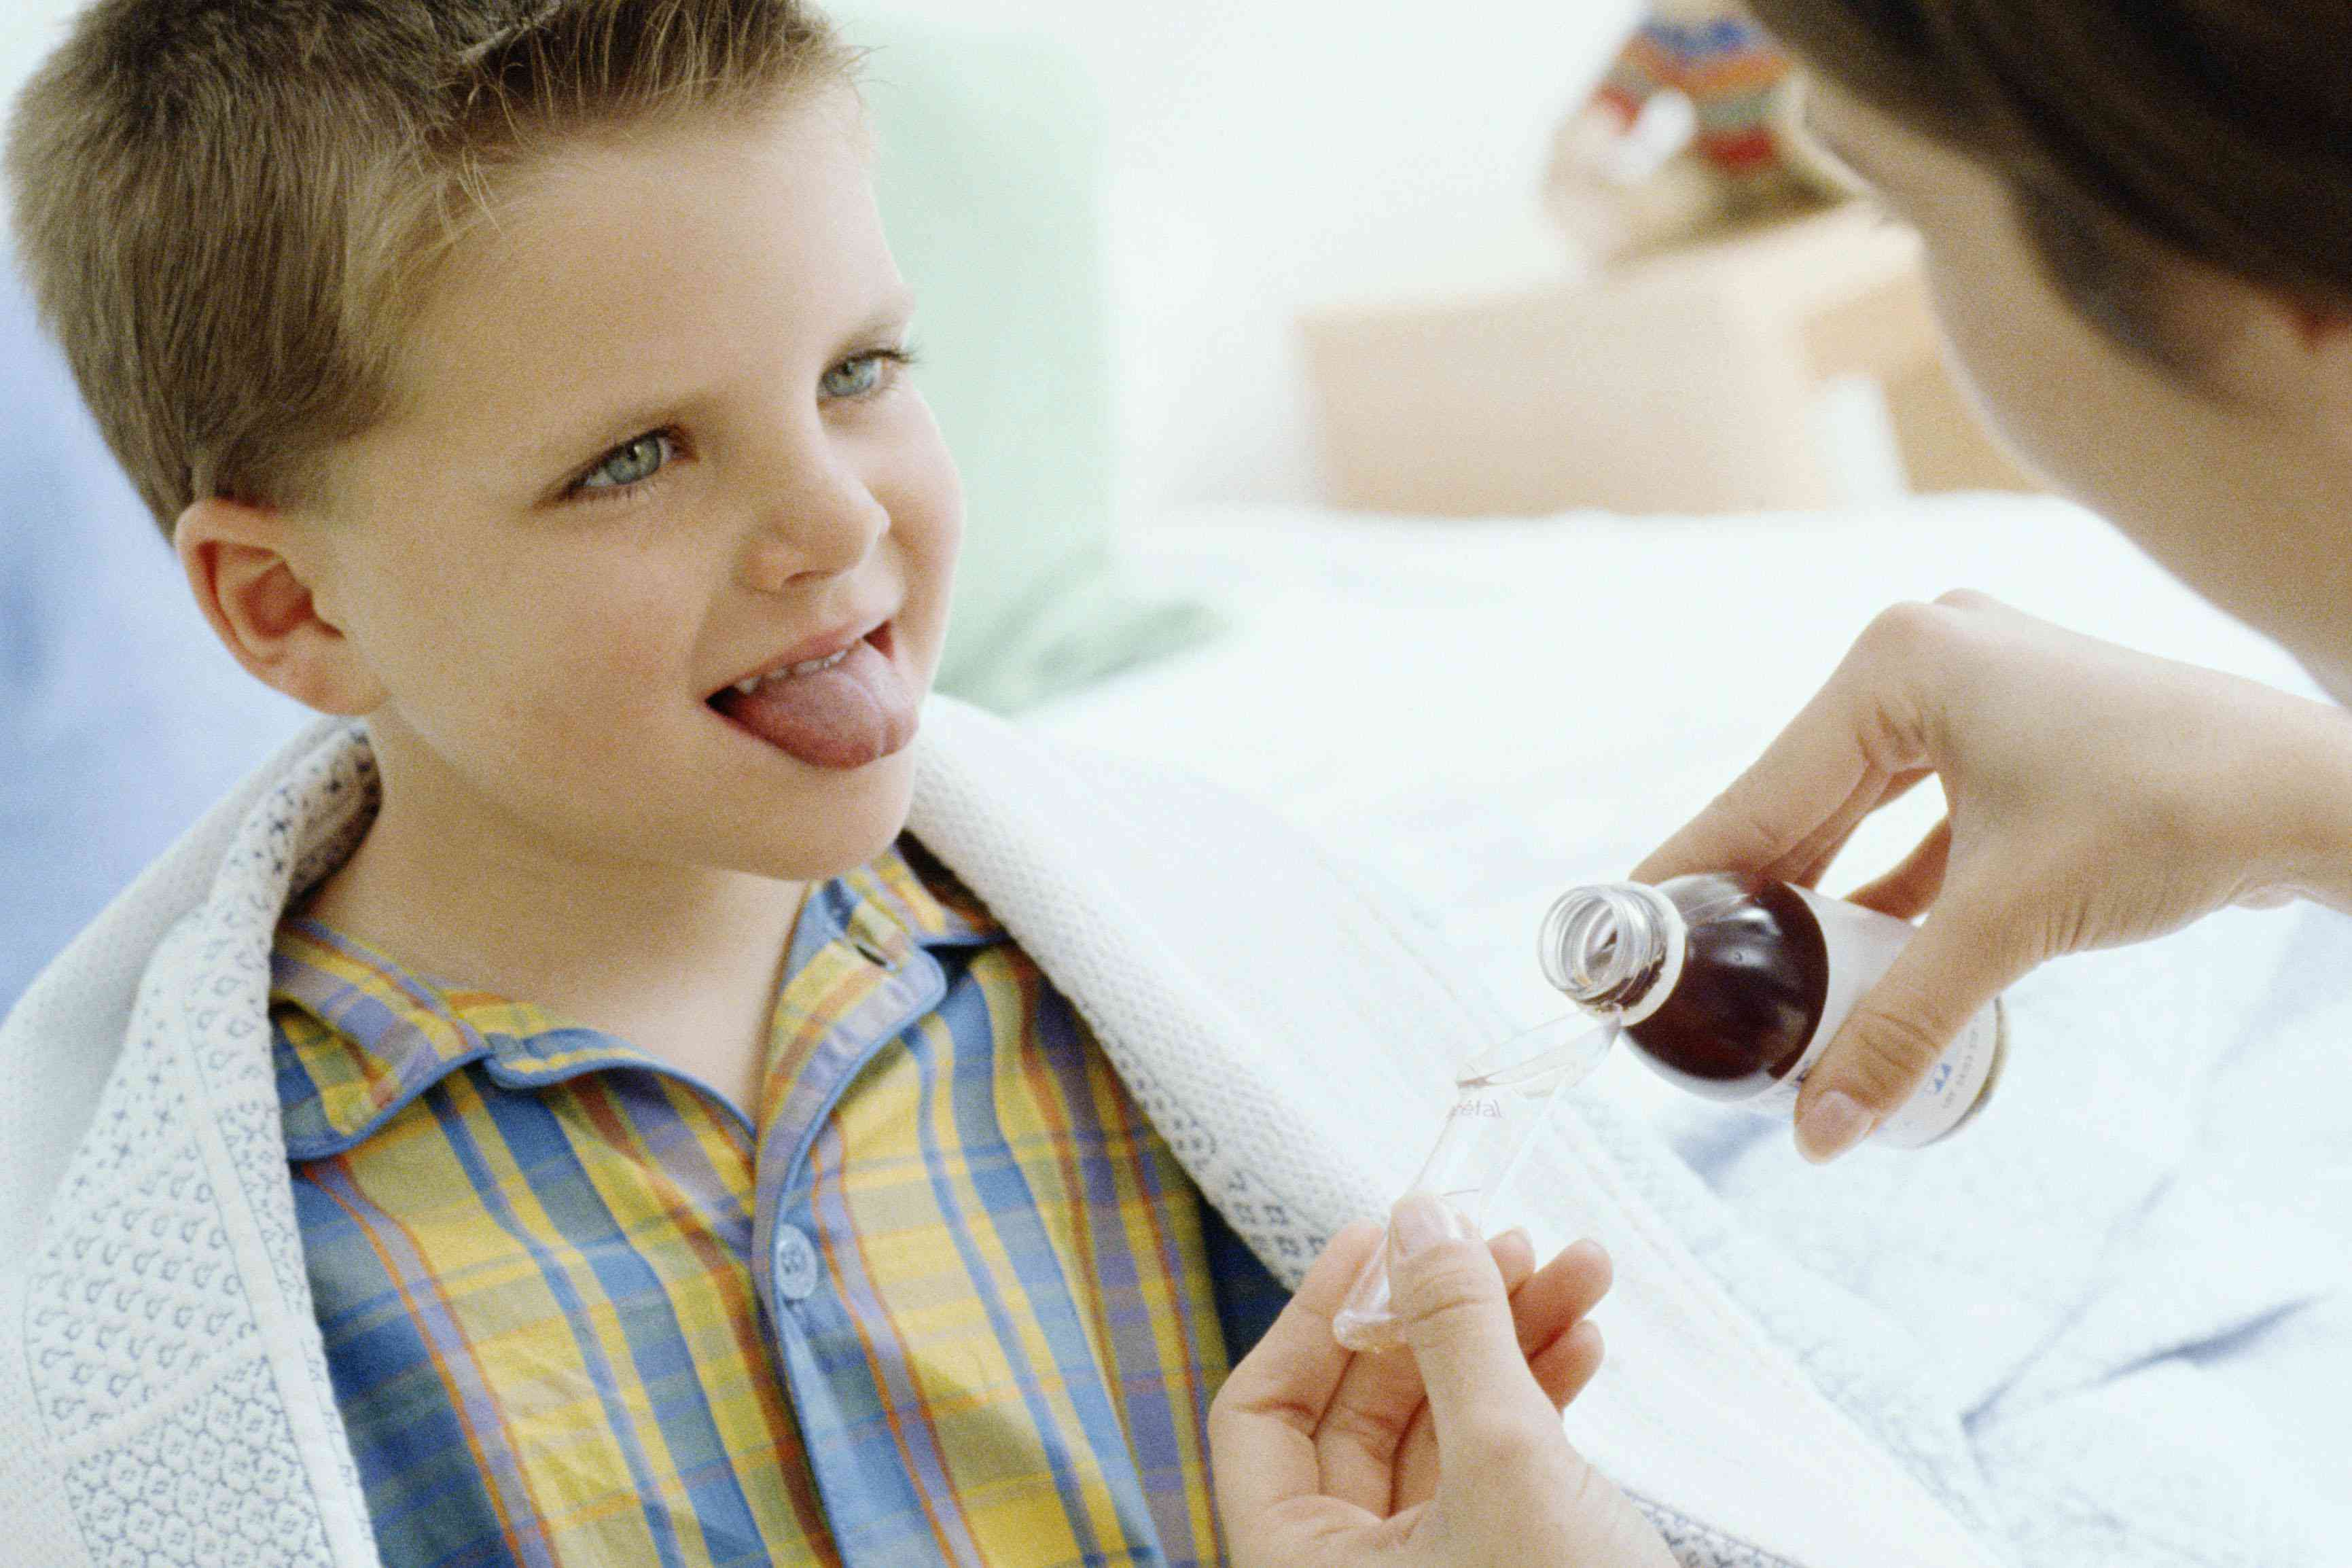 Mother giving son medicine